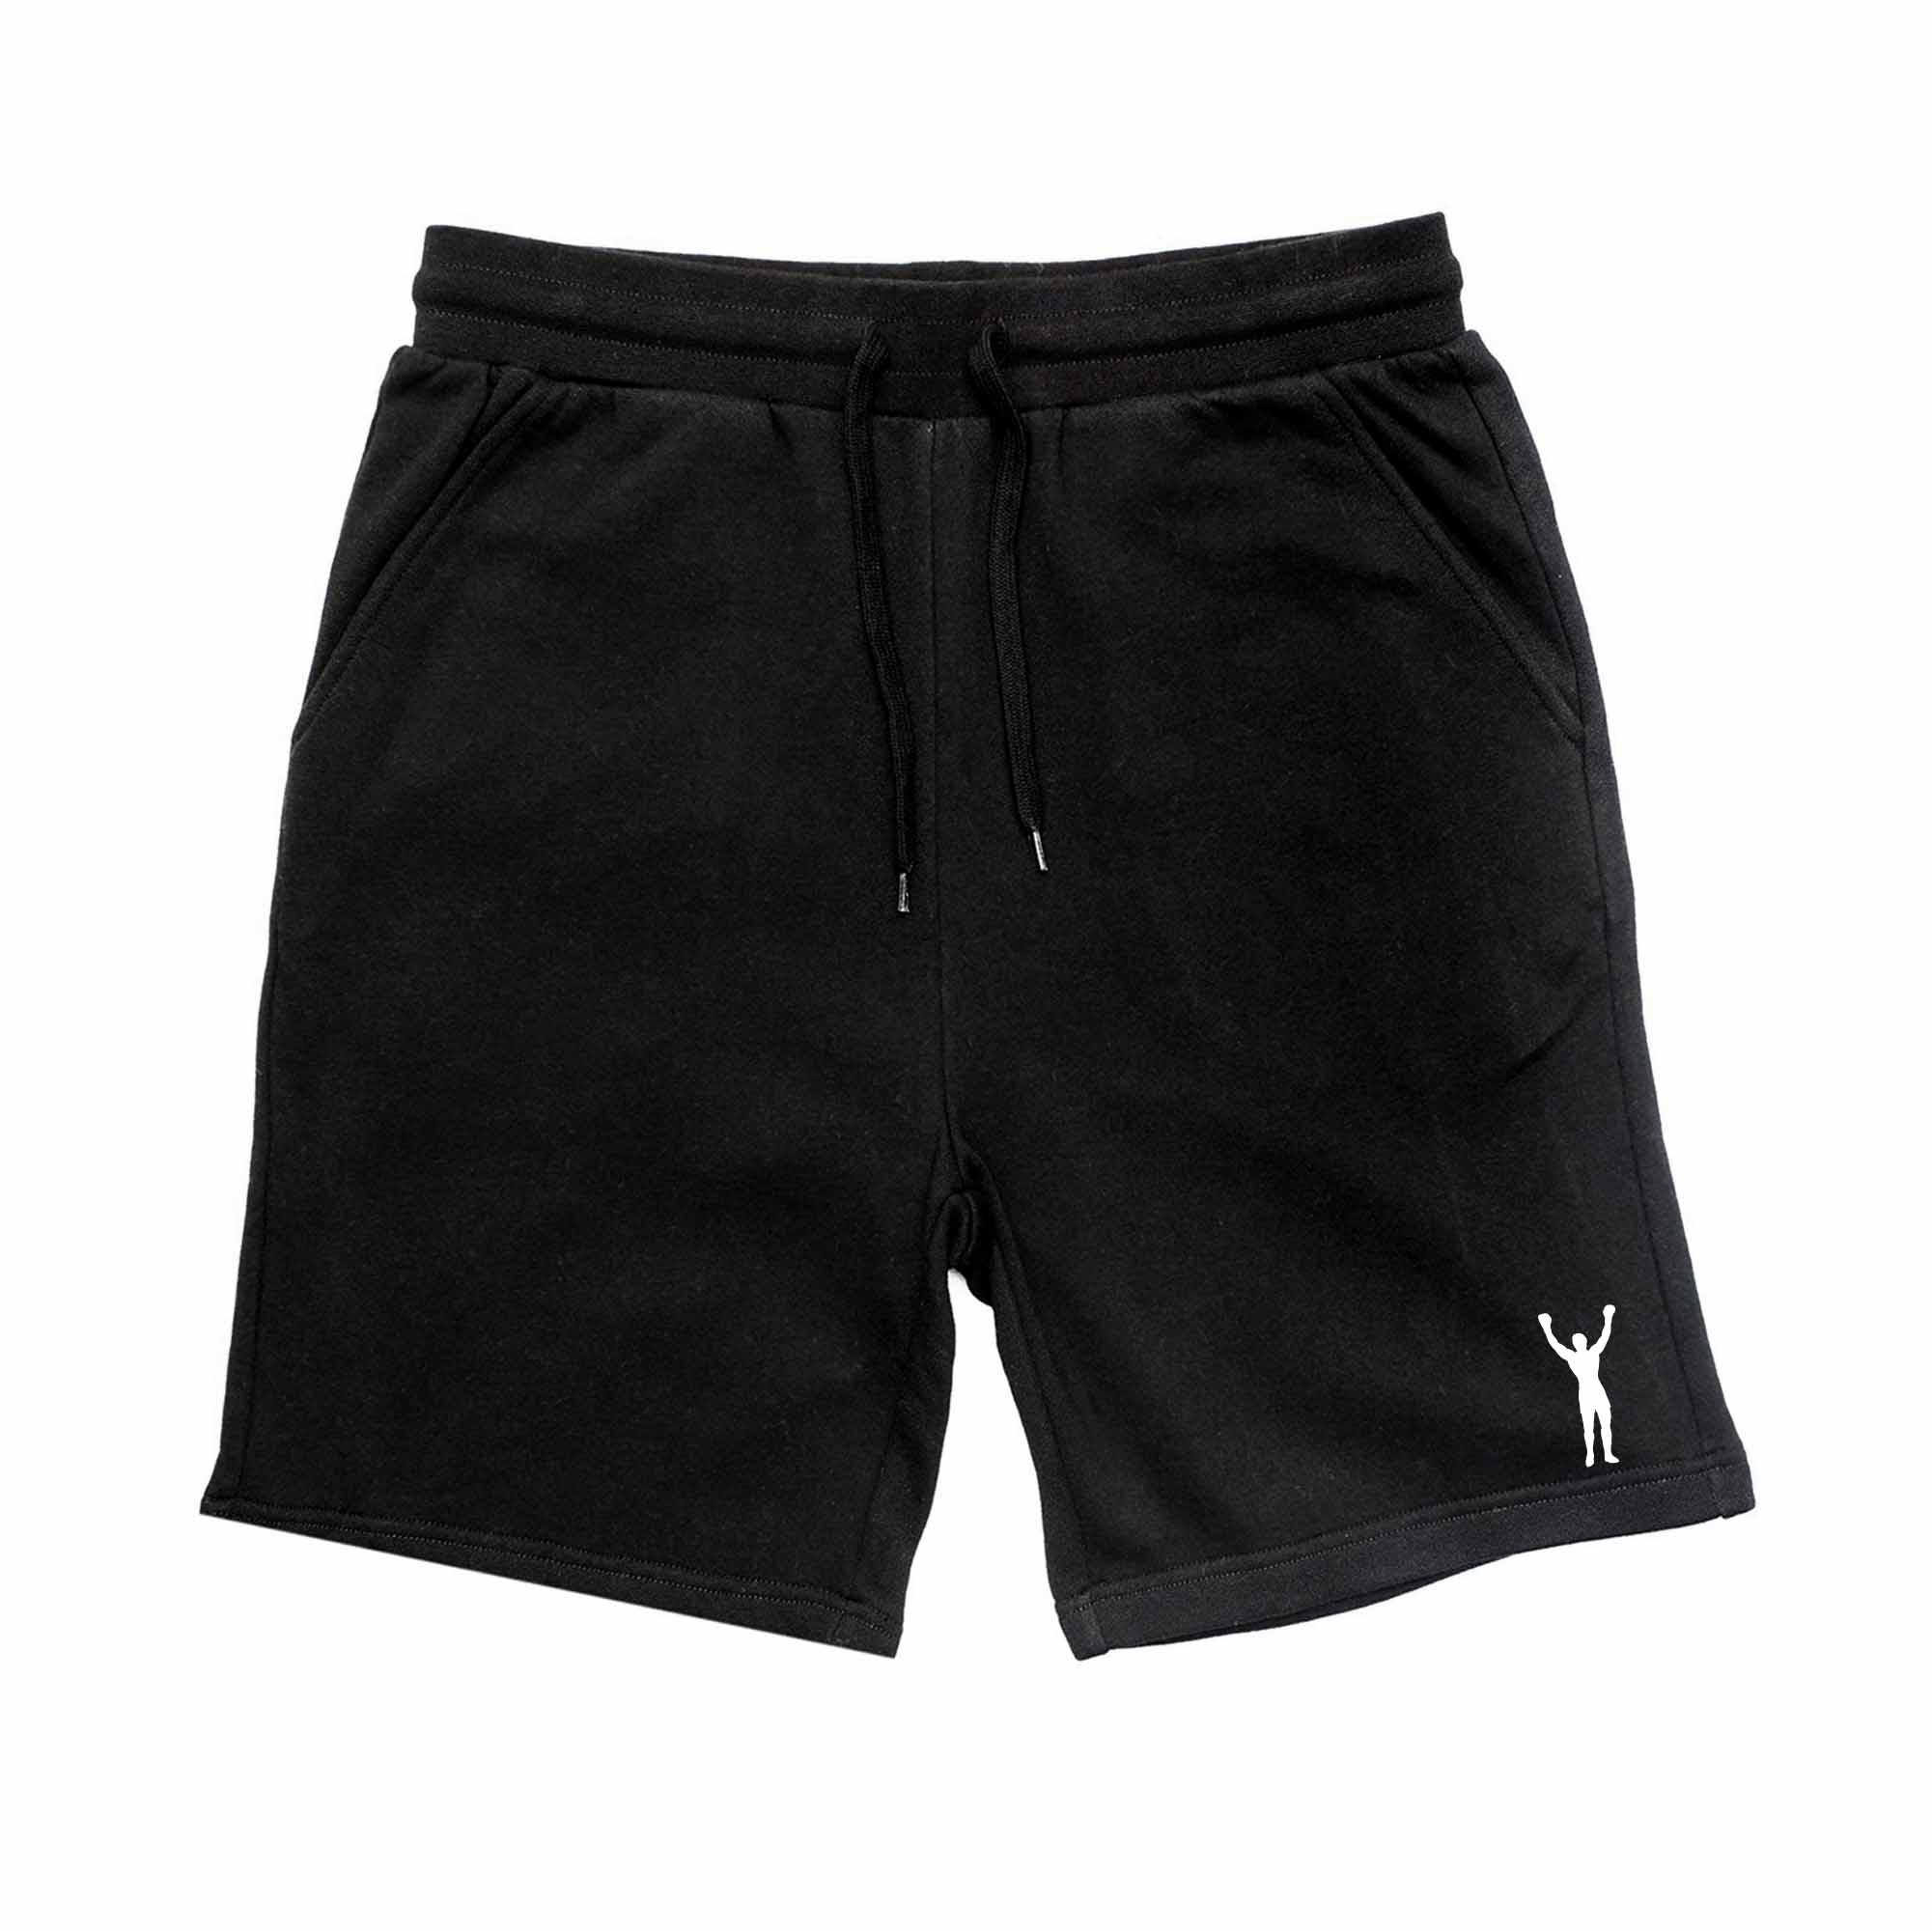 Rocky Statue Black Shorts